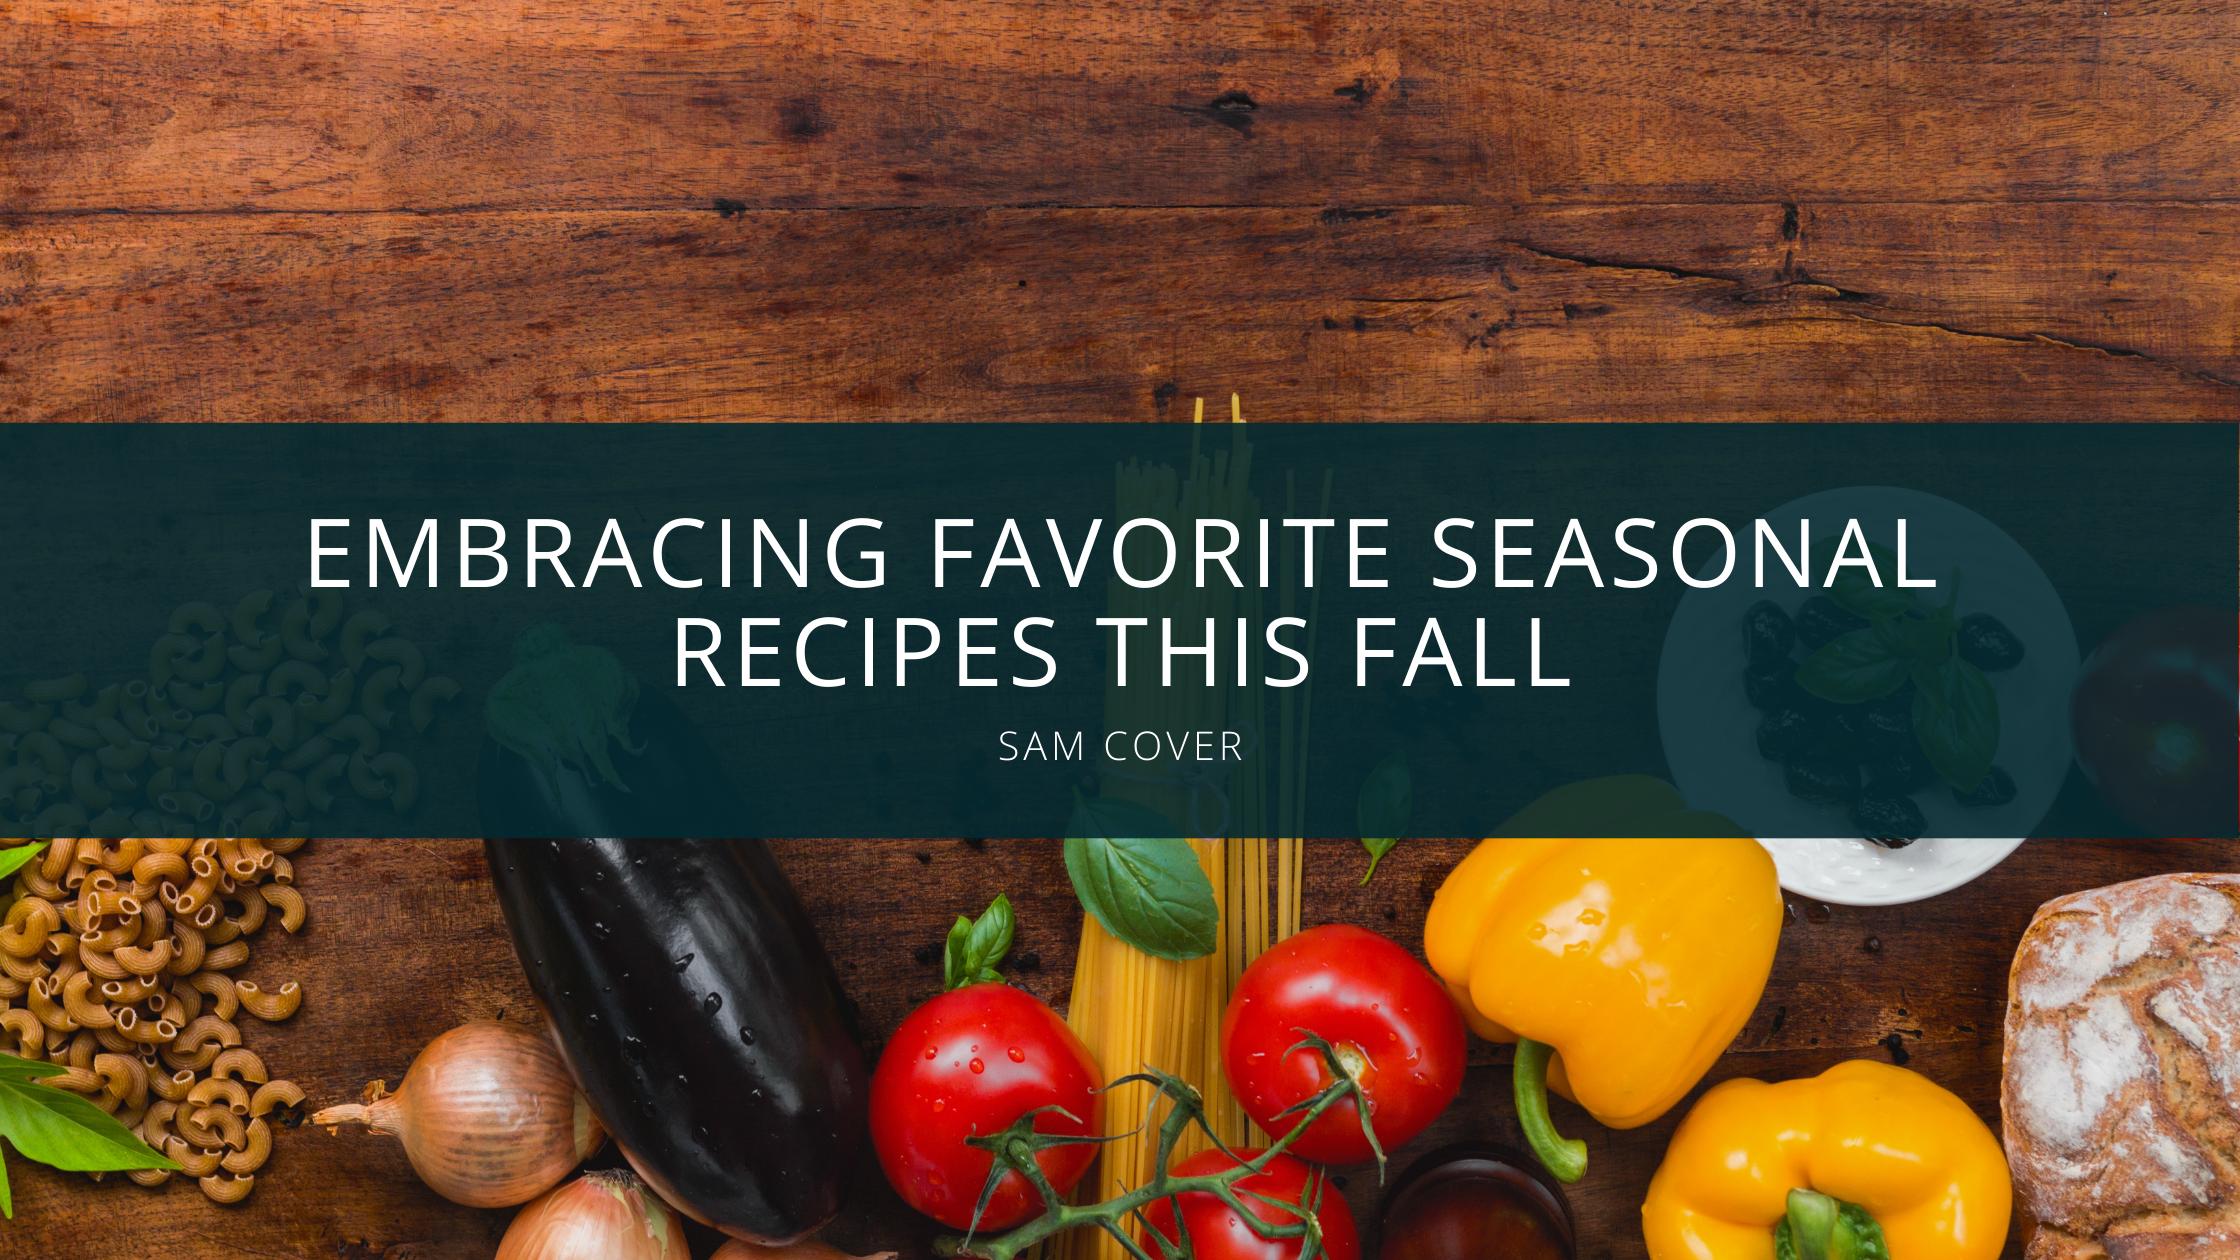 Sam Cover Spokane Washington looks forward to embracing favorite seasonal recipes this fall